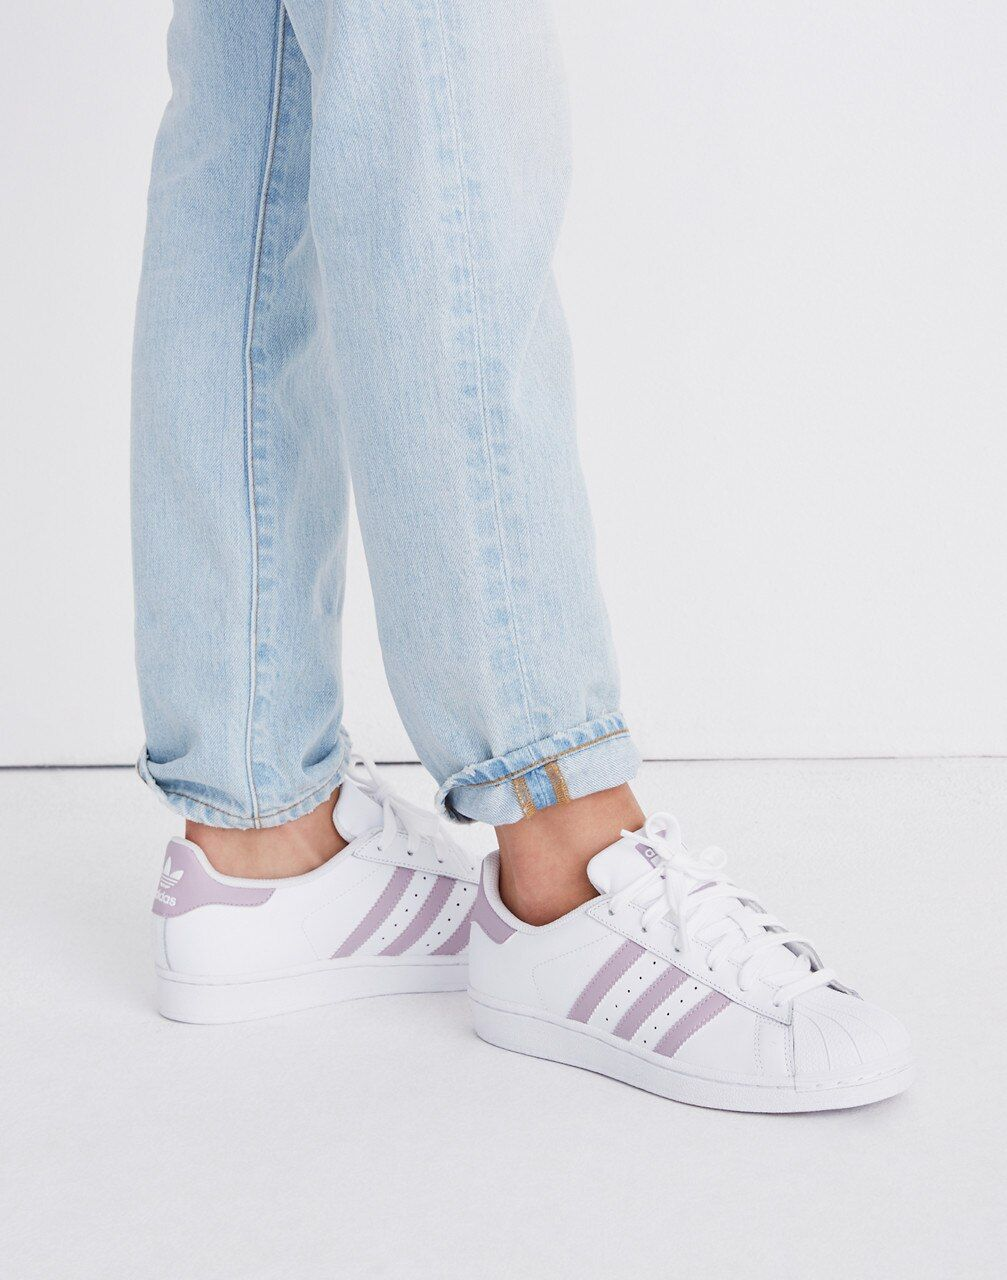 Adidas Originals Superstar Purple | Etsy